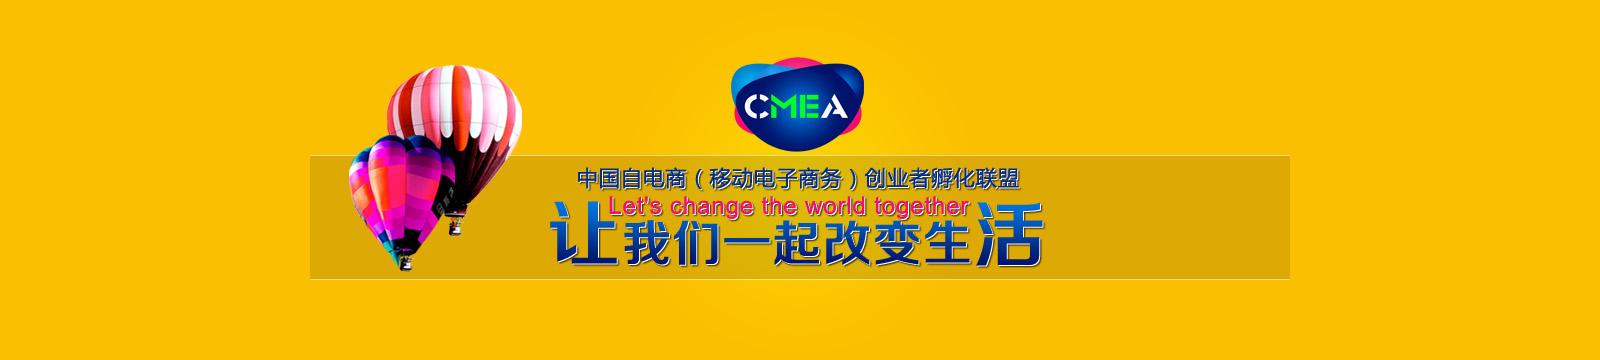 CMEA网页banner-CMEA